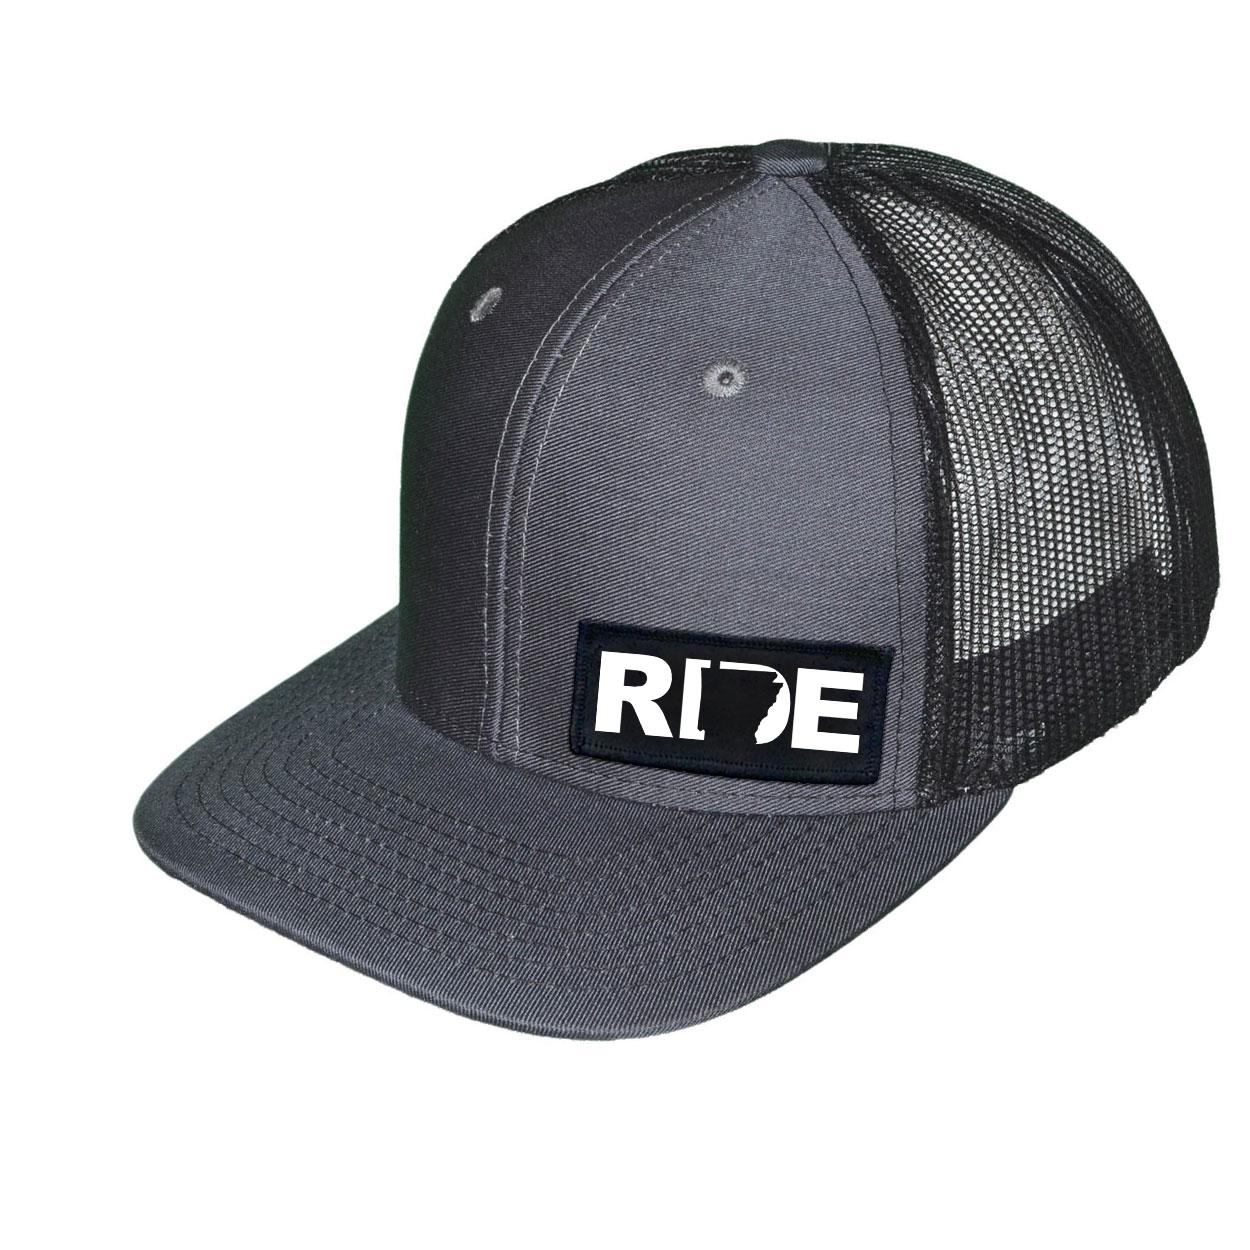 Ride Arkansas Night Out Woven Patch Snapback Trucker Hat Dark Gray/Black (White Logo)